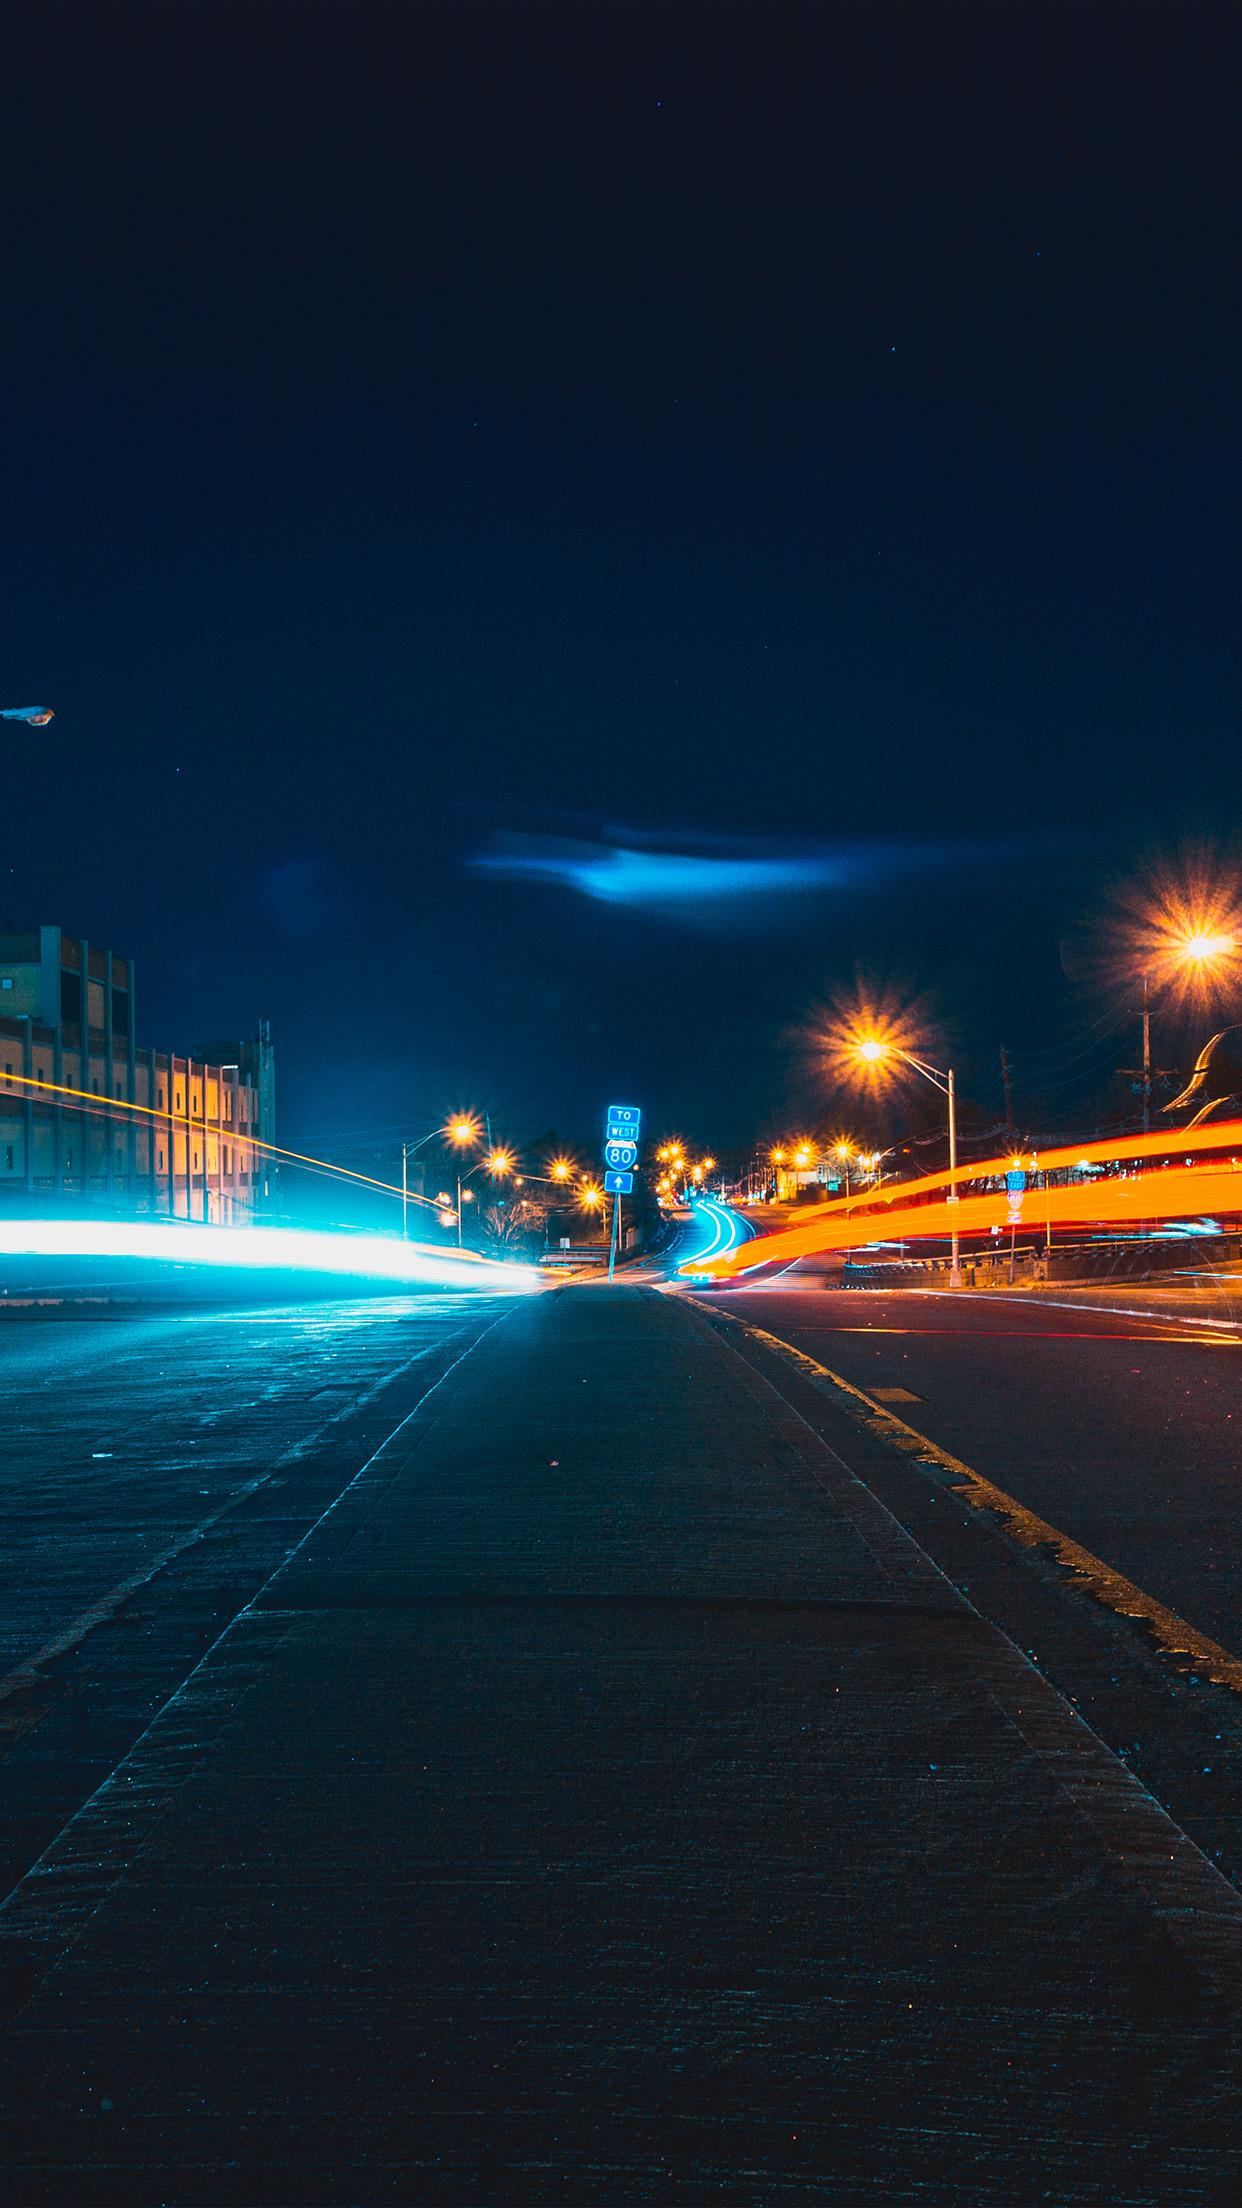 Nq57 Street Light Night City Nature Wallpaper